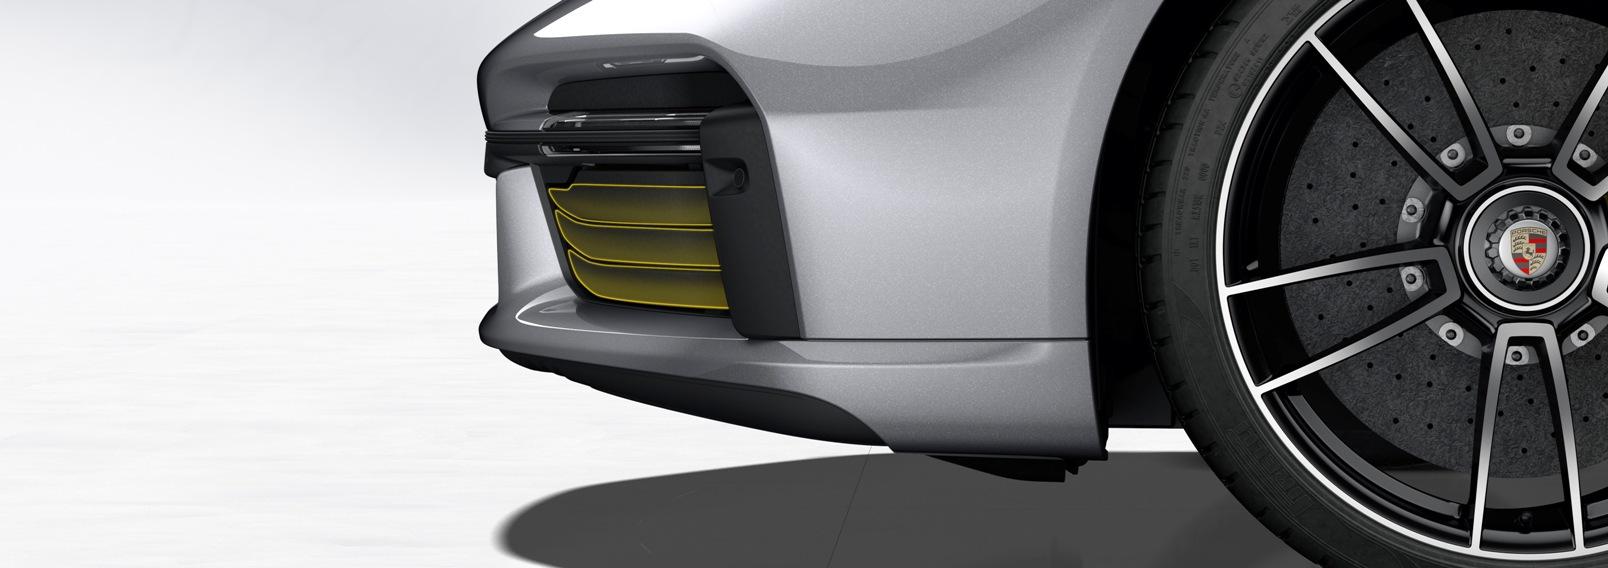 Aerodinámica Porsche 911 Turbo S (4)